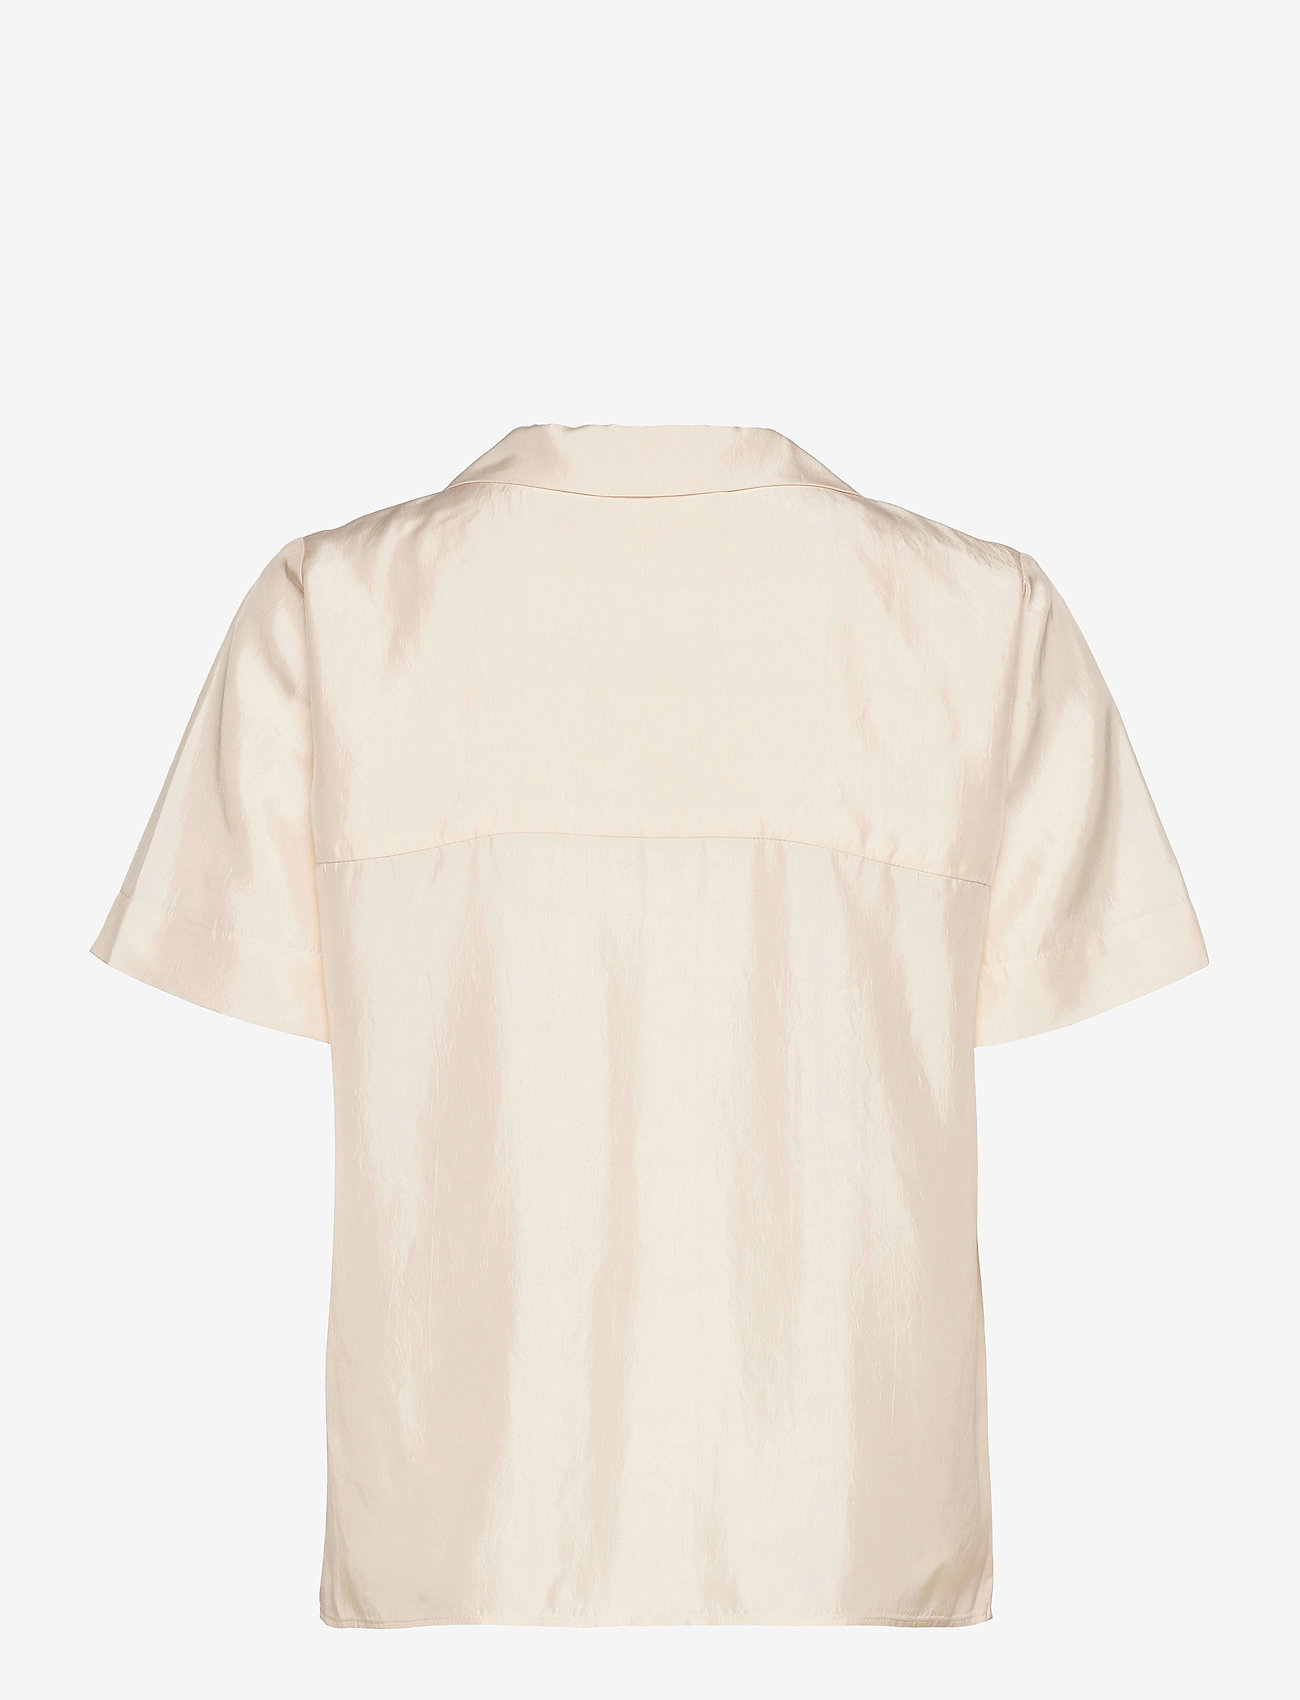 Fall Winter Spring Summer - Hong Kong Garden - kortärmade skjortor - jet stream white - 1